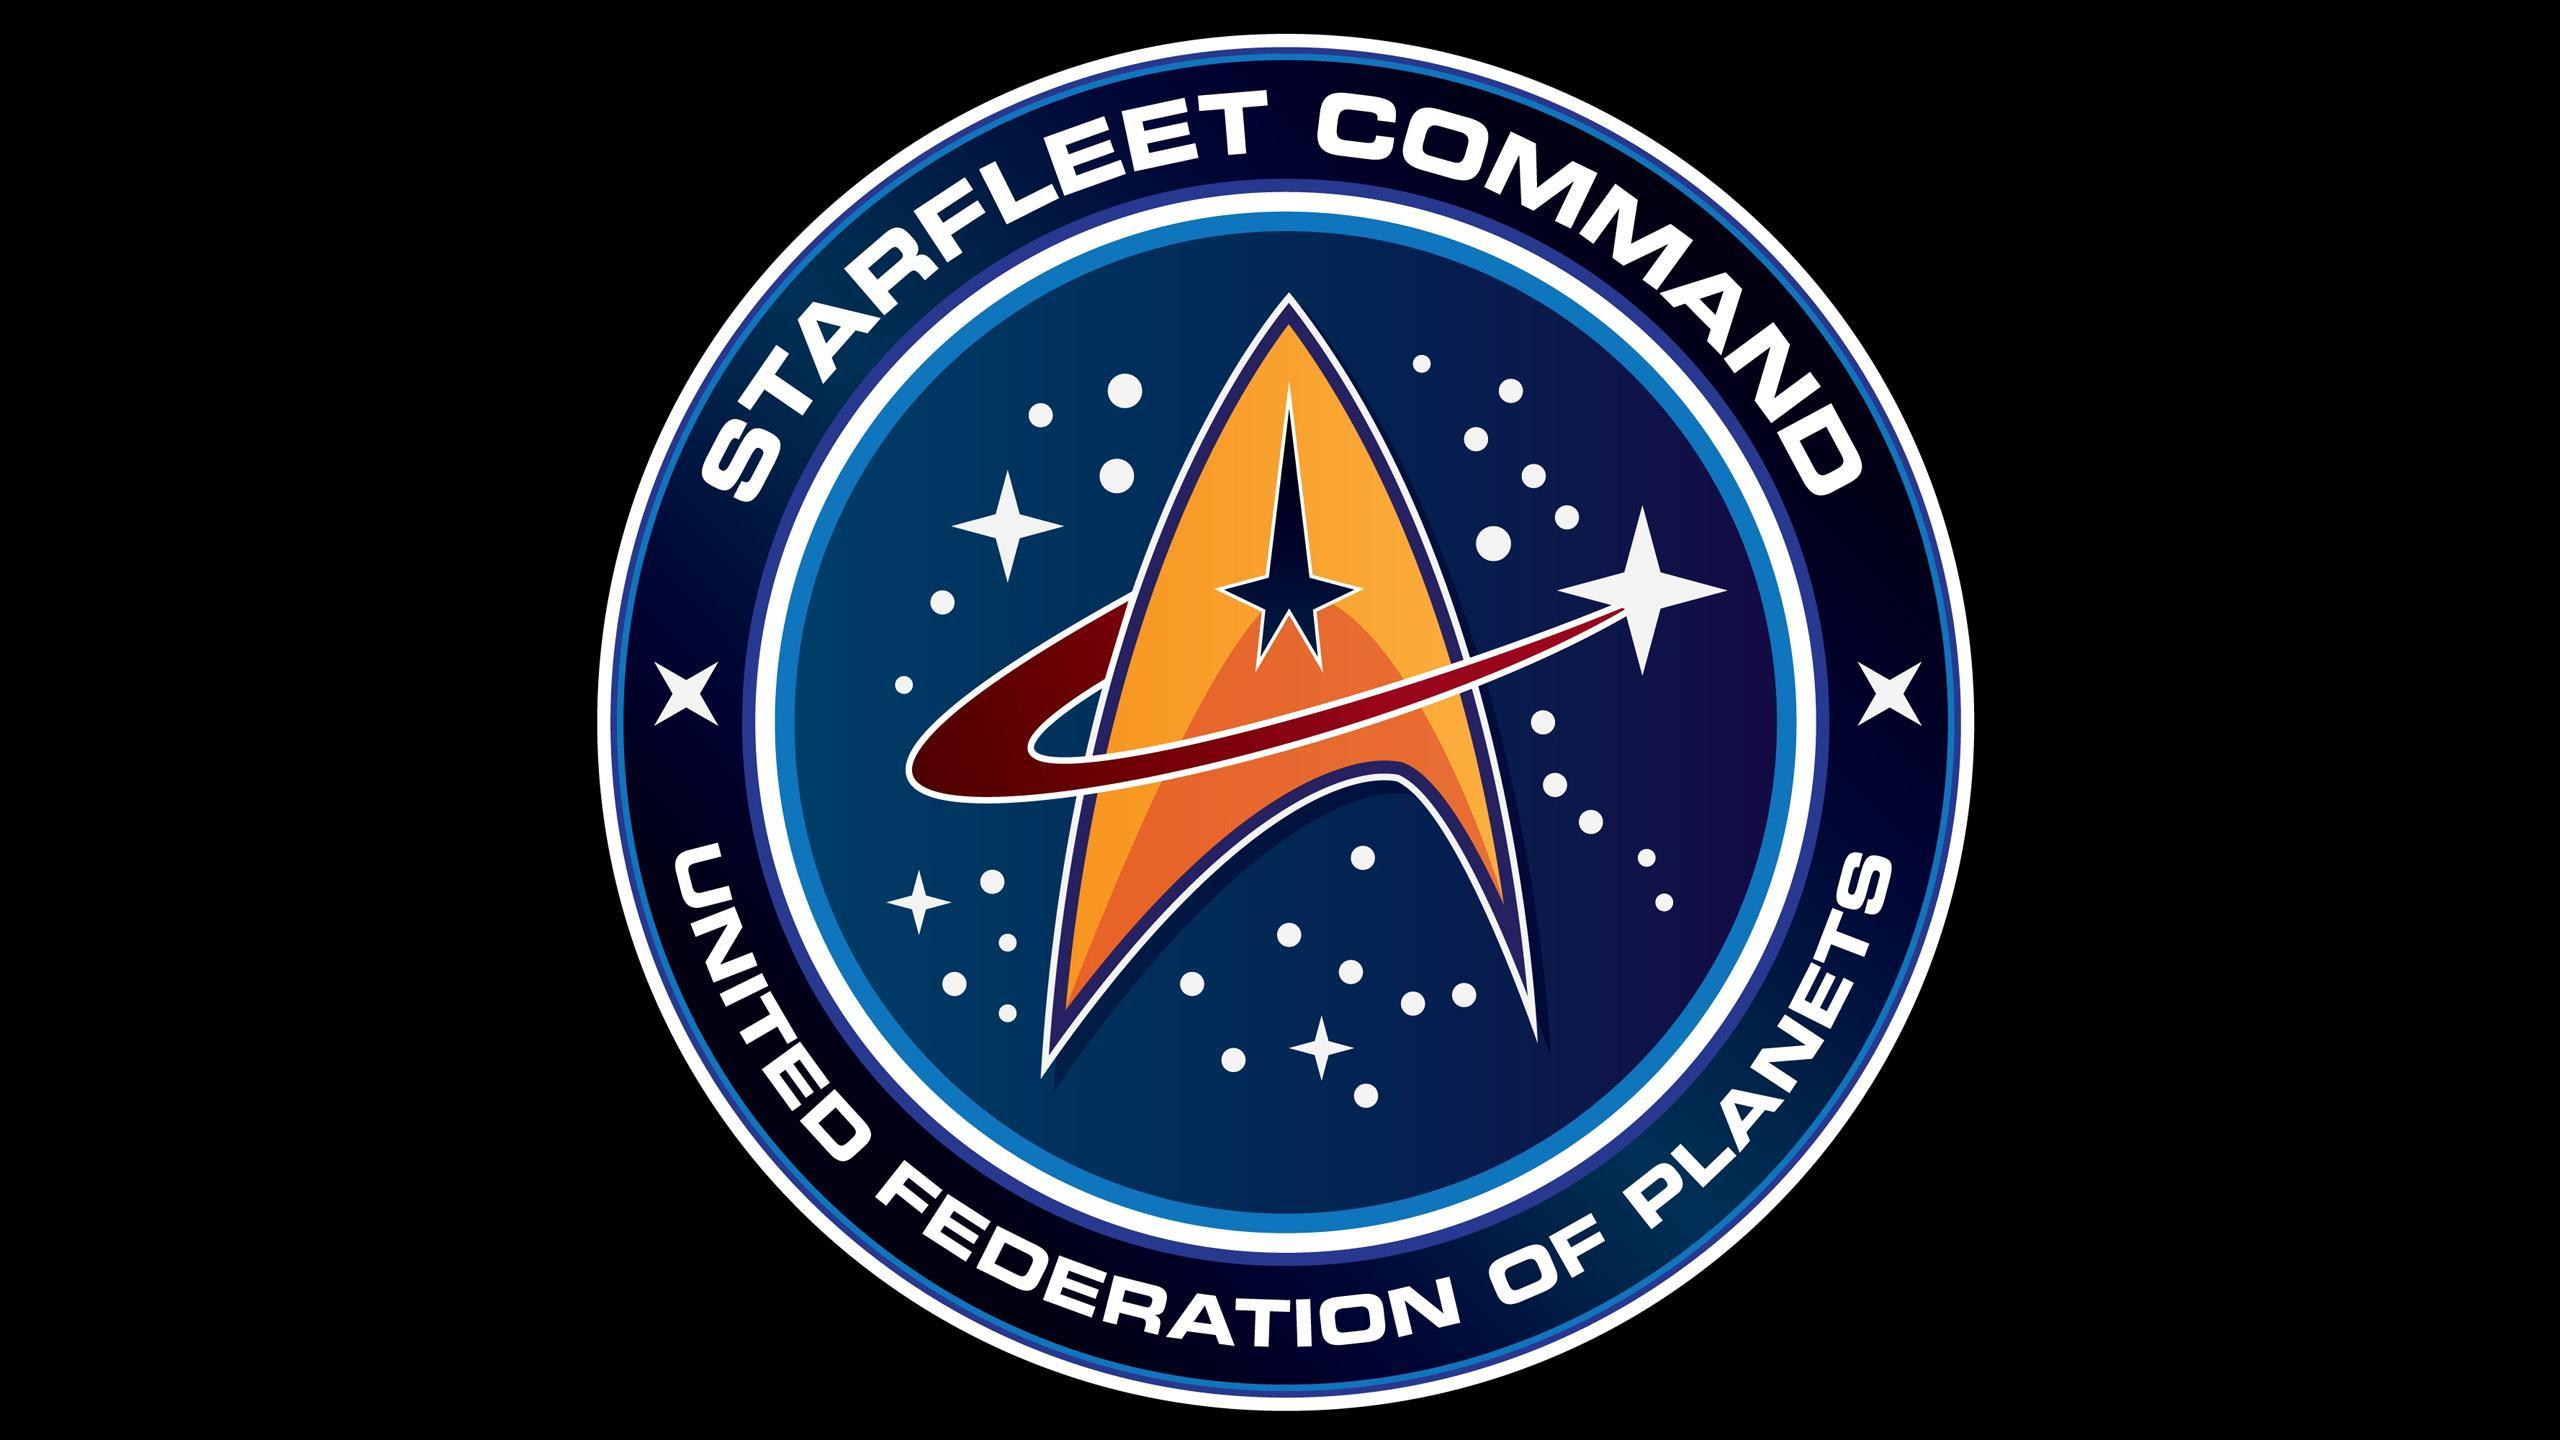 Cars Symbol Wallpaper Hd Starfleet Command In Star Trek Wallpaper Download